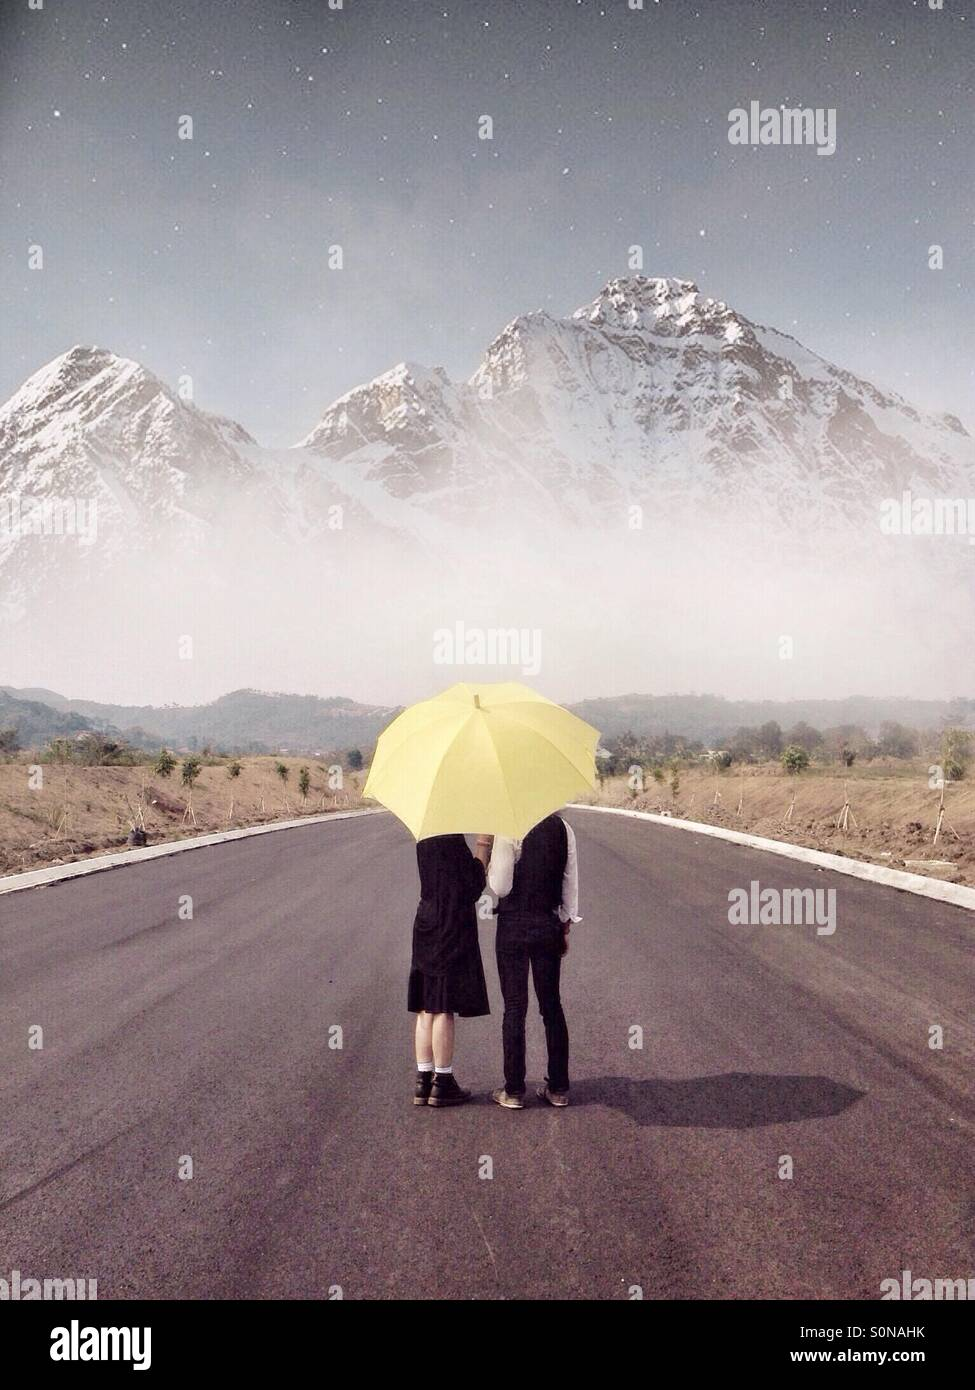 Unter meinem Regenschirm. Stockbild